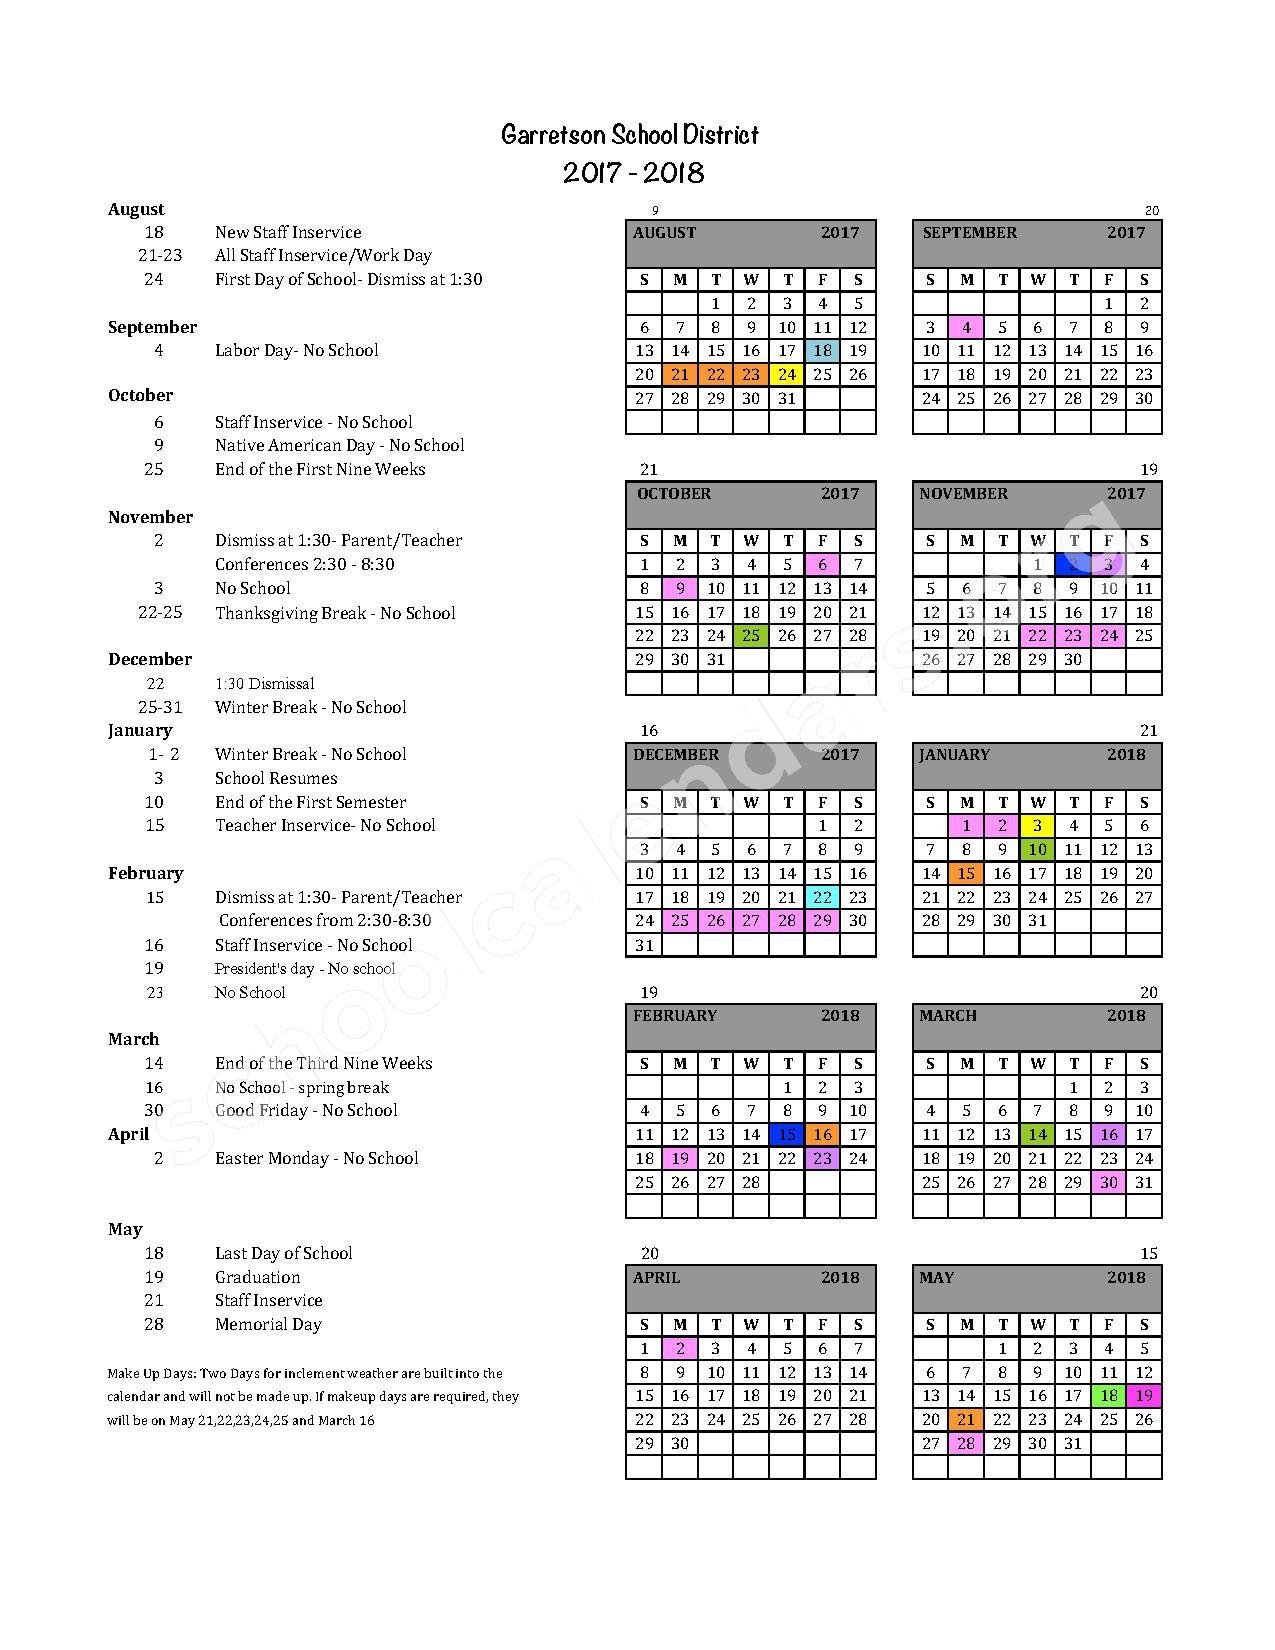 2017 - 2018 School Calendar – Garretson School District 49-4 – page 1